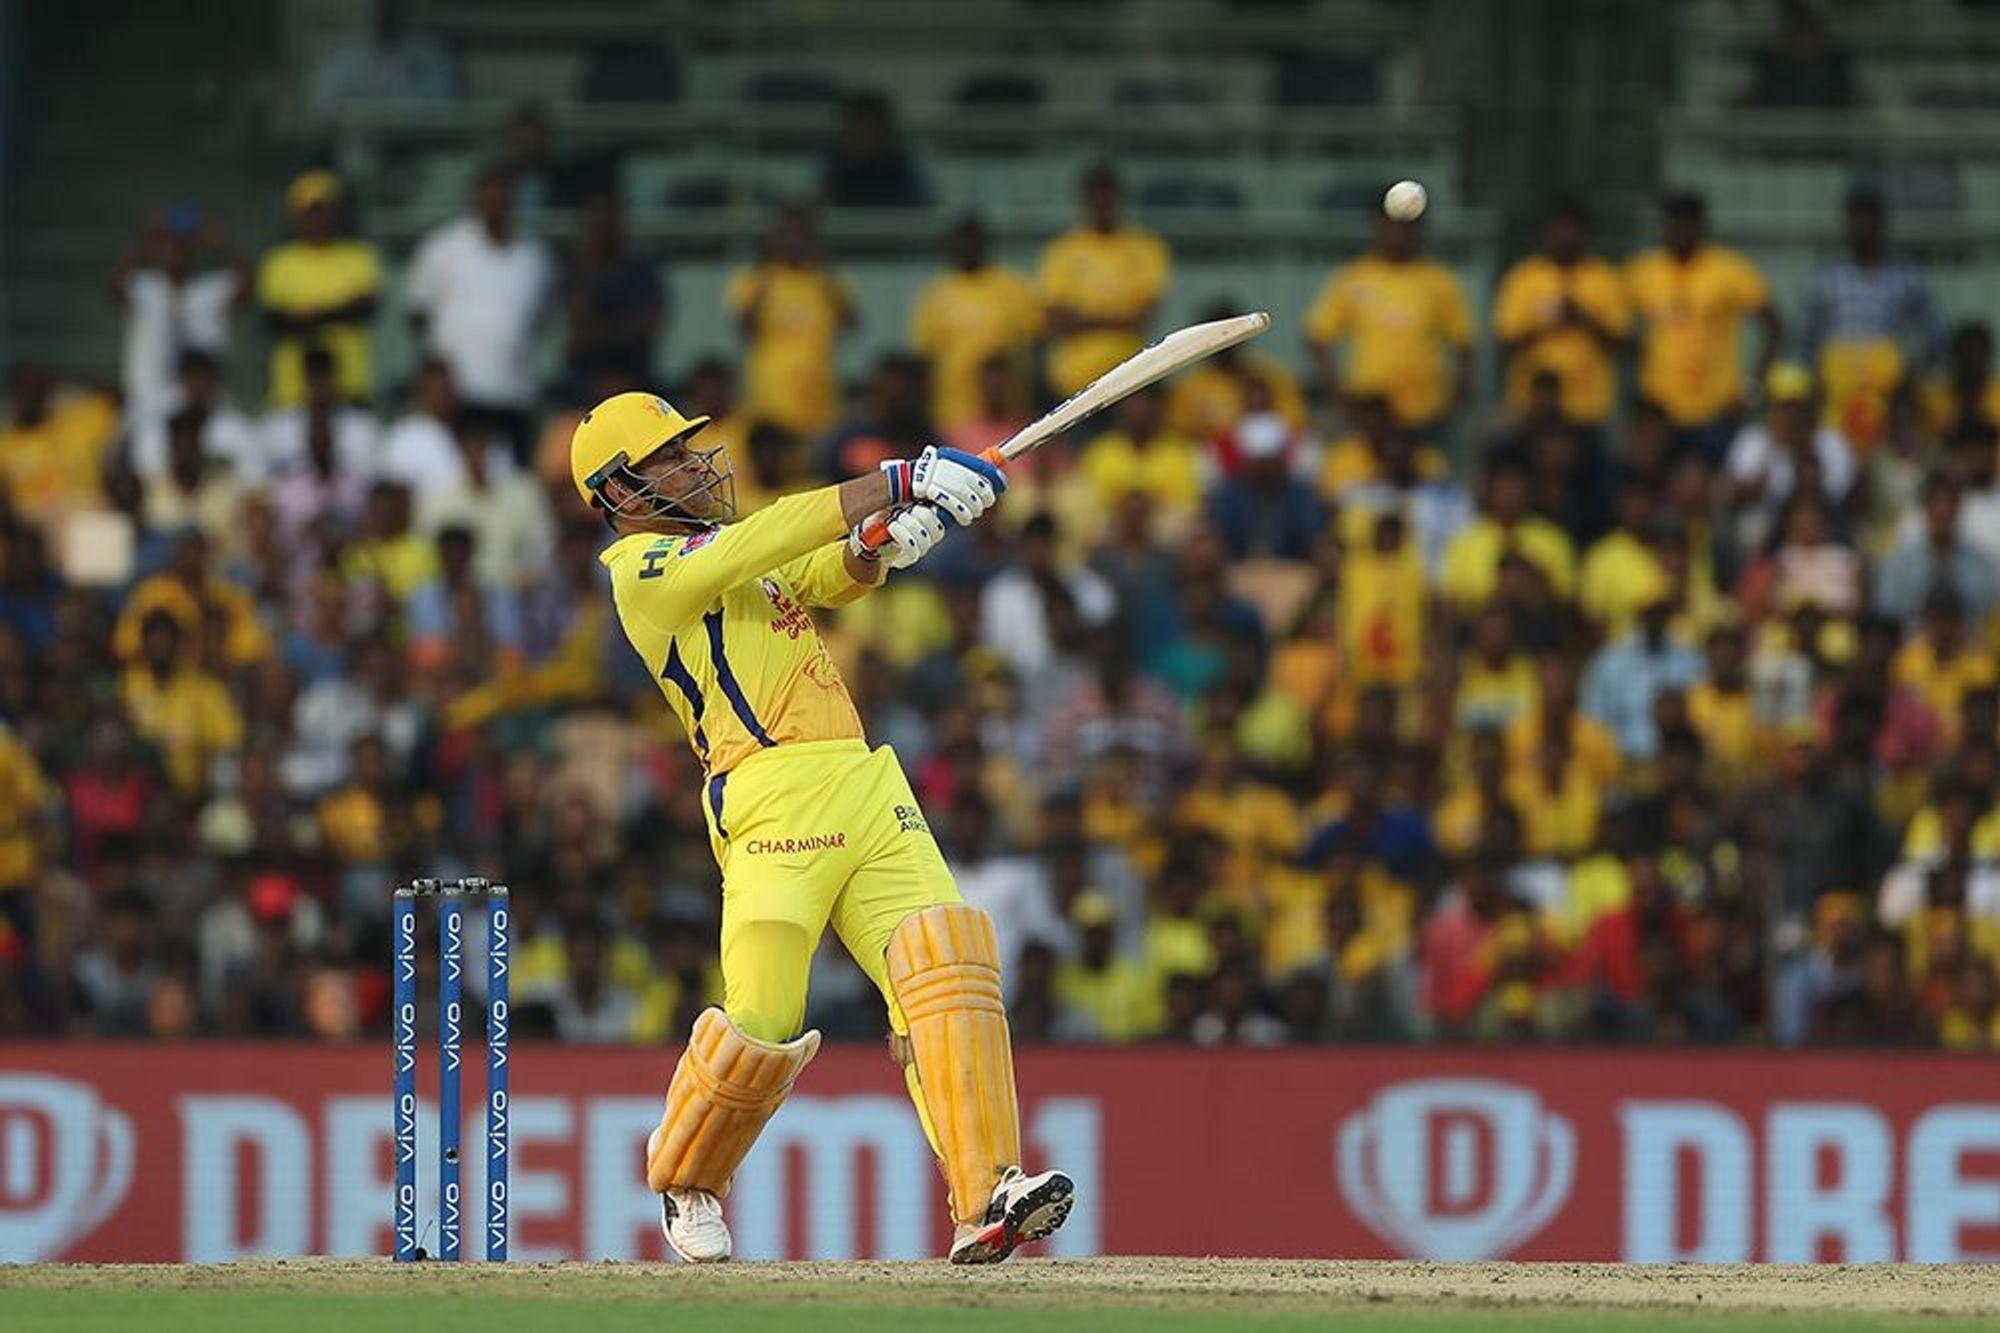 आईपीएल 2019 : जीत दर्ज करते ही इतिहास रच देंगे धोनी ऐसा करने वाले बन जाएँगे पहले कप्तान